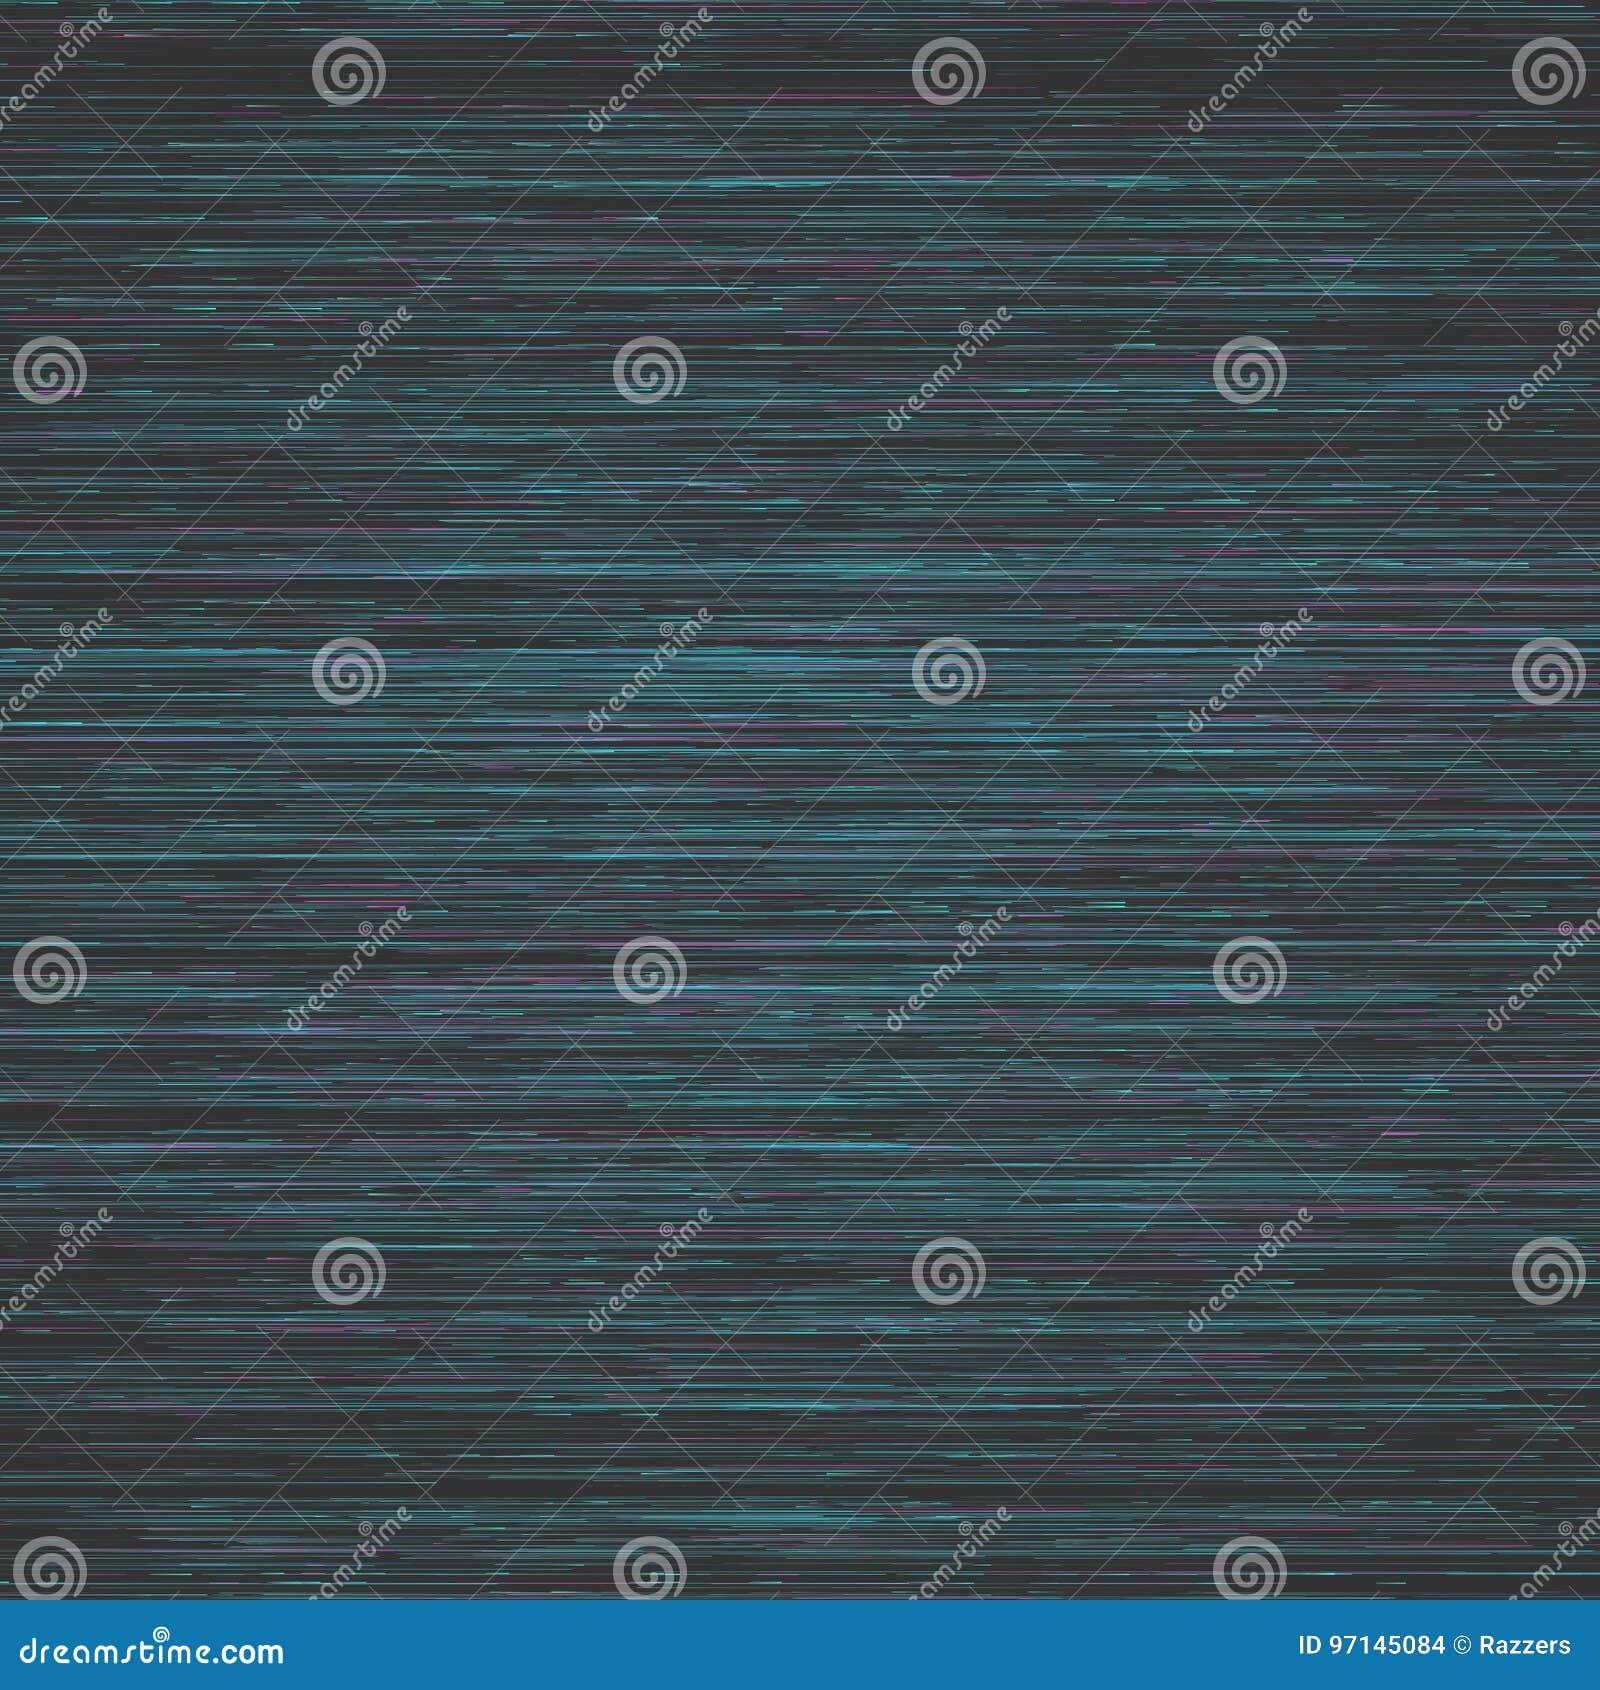 Digital-Störschub-Vektor-Hintergrund Vektor verzerrter Signal-großer Daten-Schaden